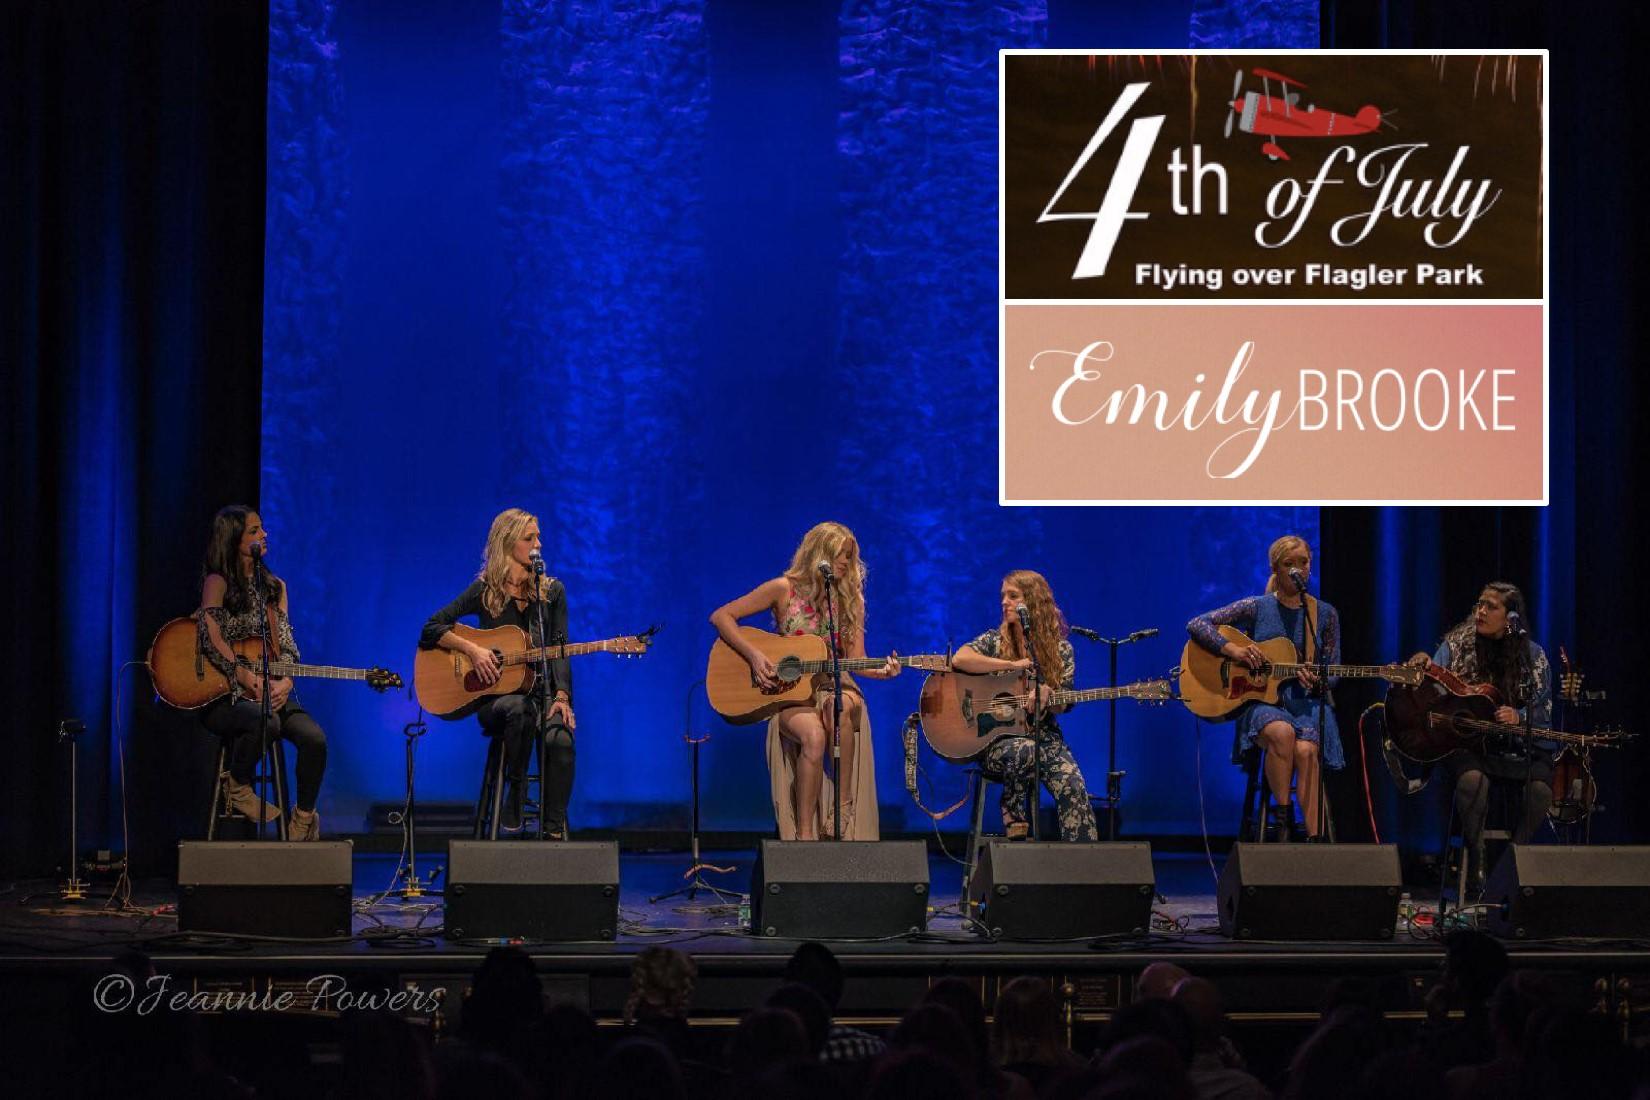 Emily Brooke Band at 4th of July